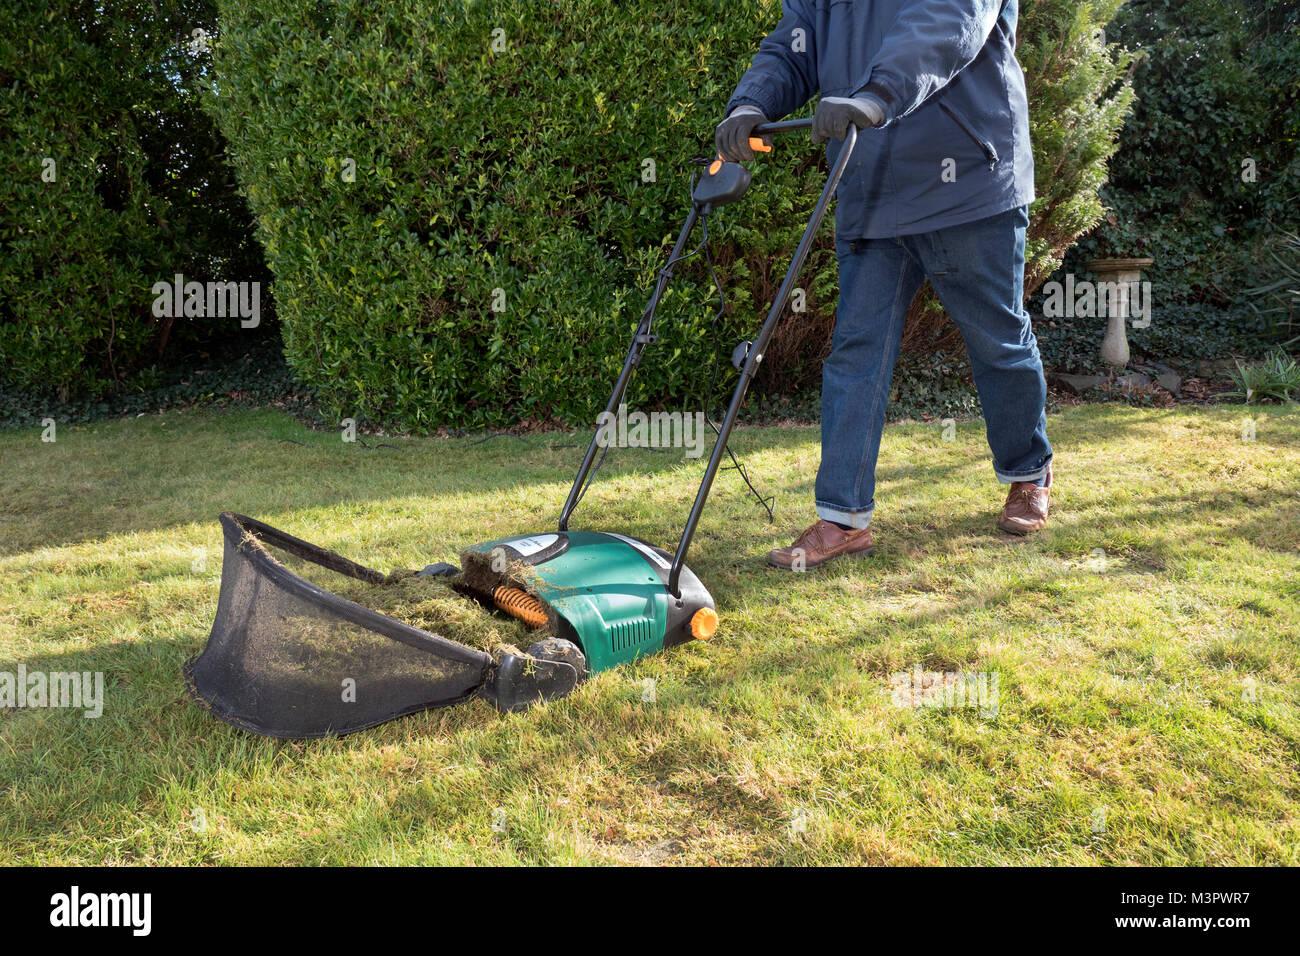 Gardener using an electric garden lawn raker. - Stock Image